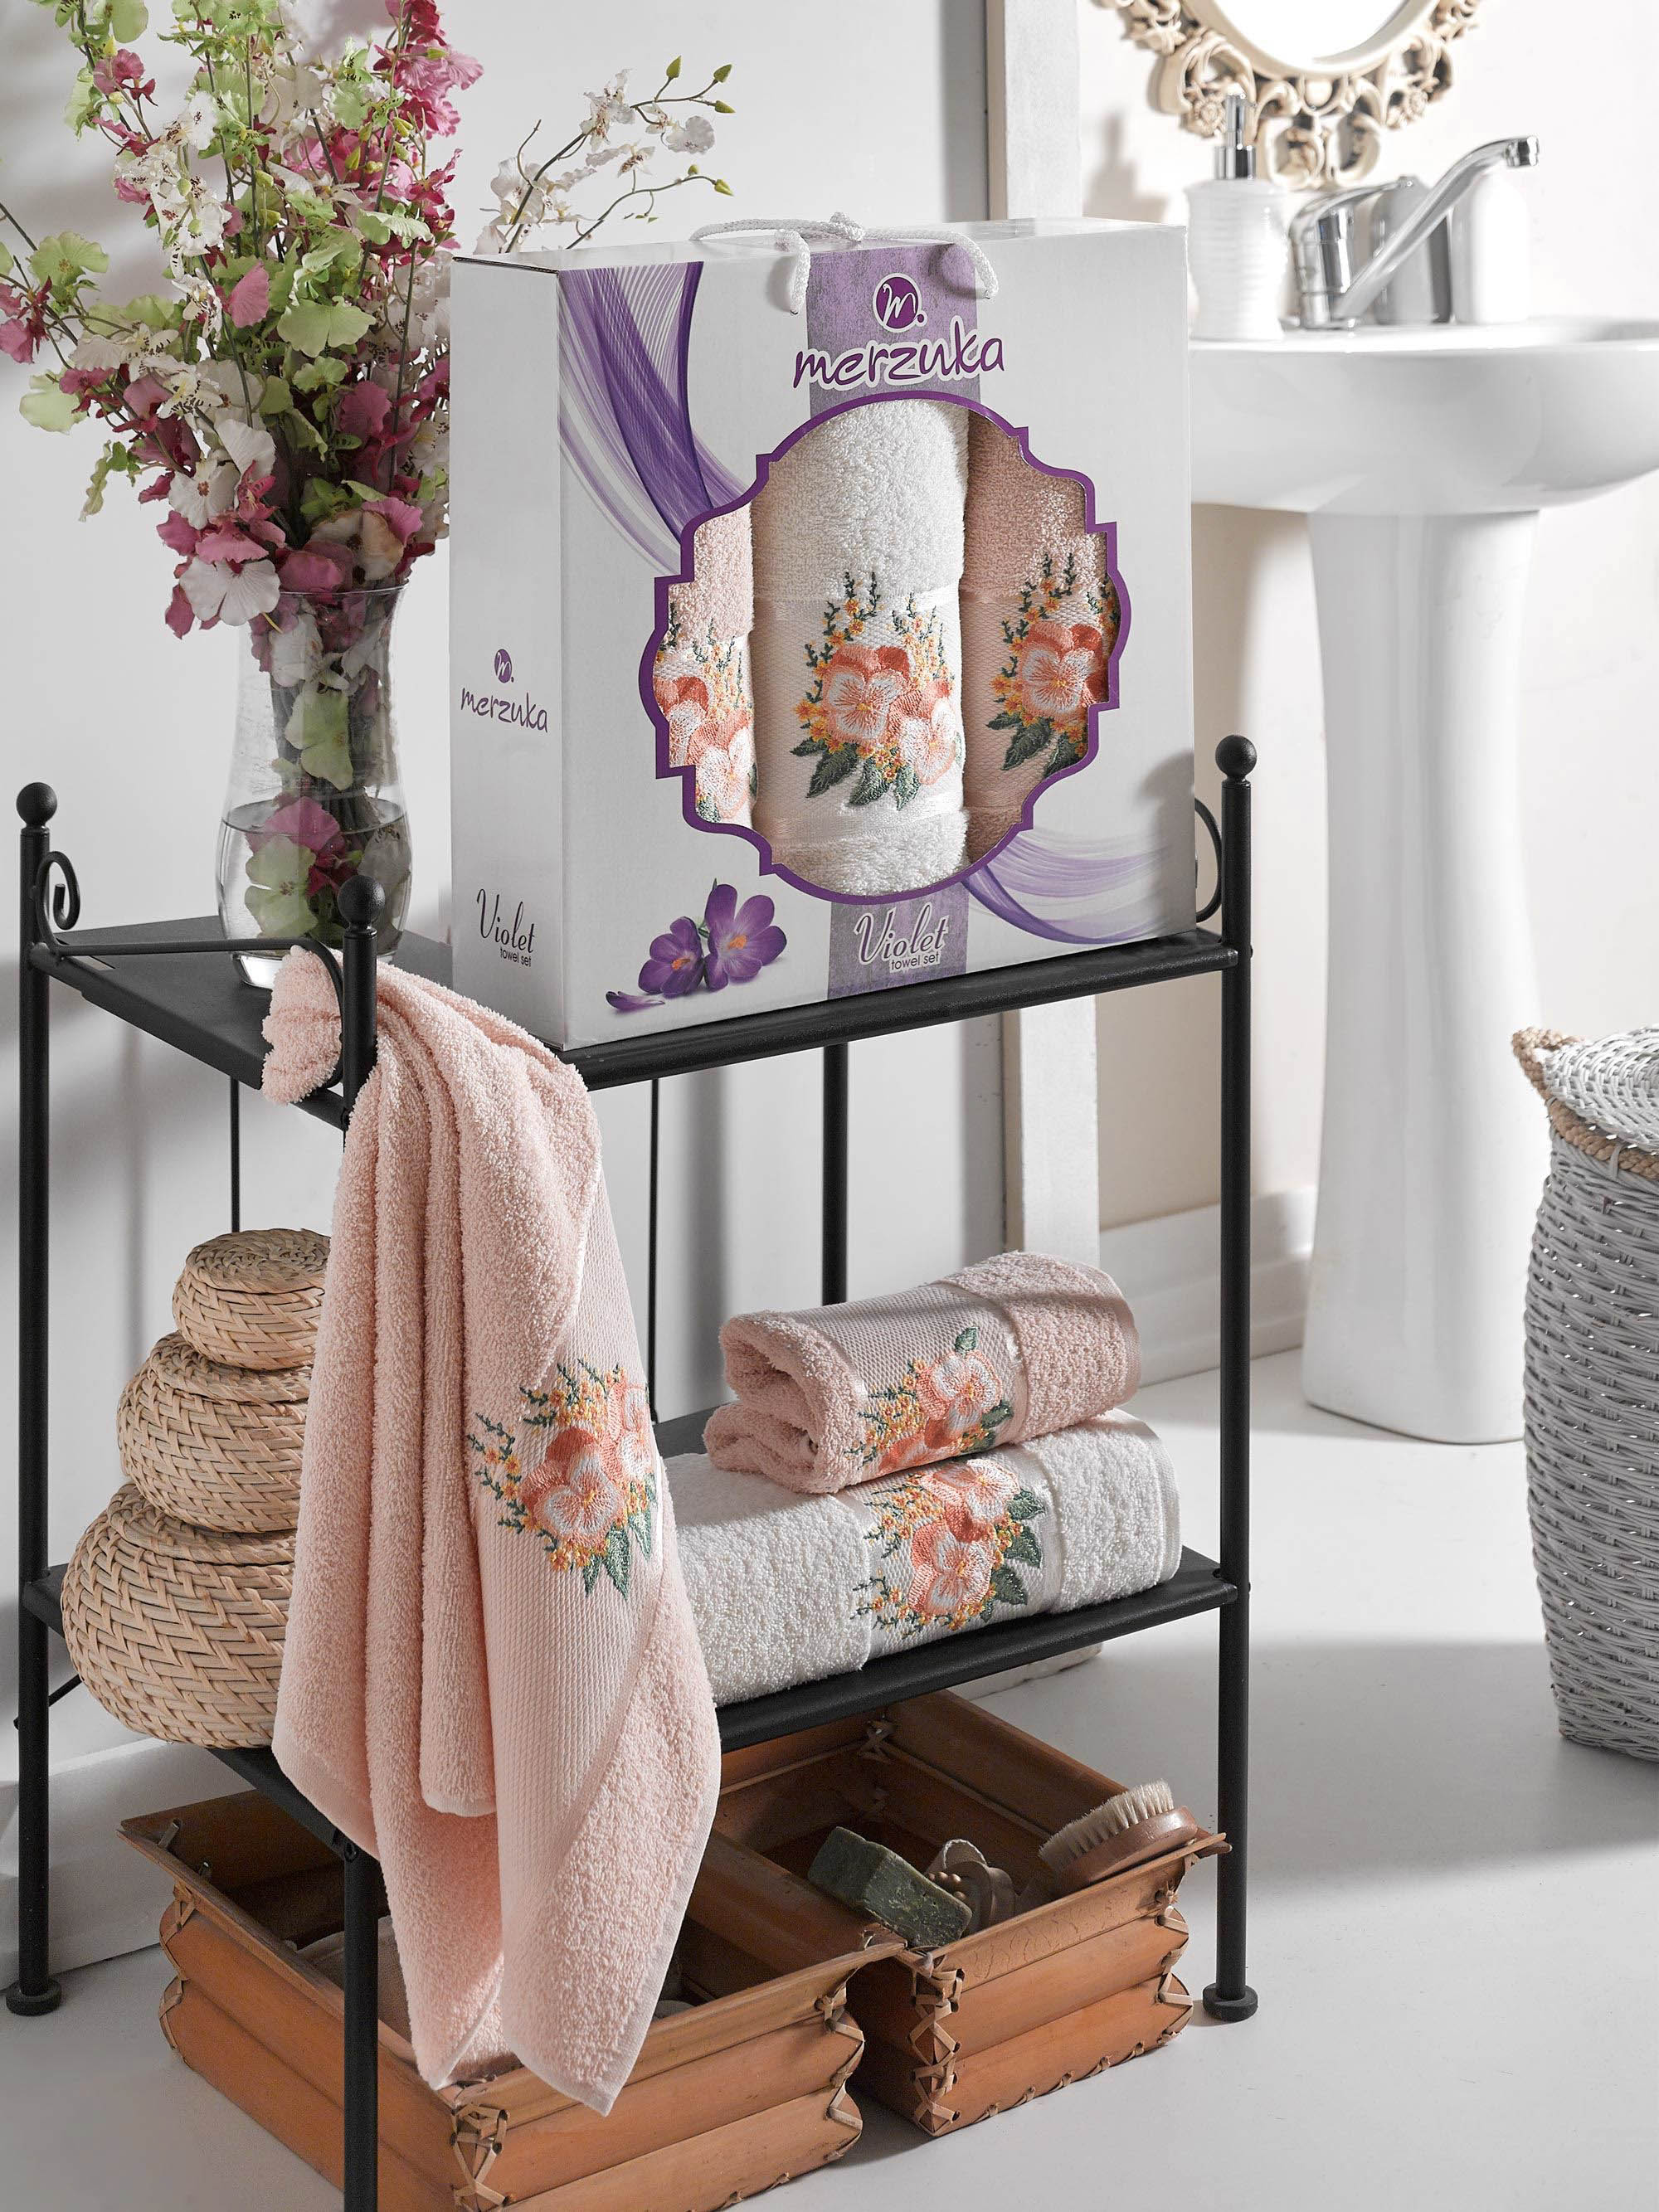 Купить Полотенца Oran Merzuka, Полотенце Violet Цвет: Пудра (50х80 см - 2 шт, 70х130 см), Турция, Персиковый, Махра